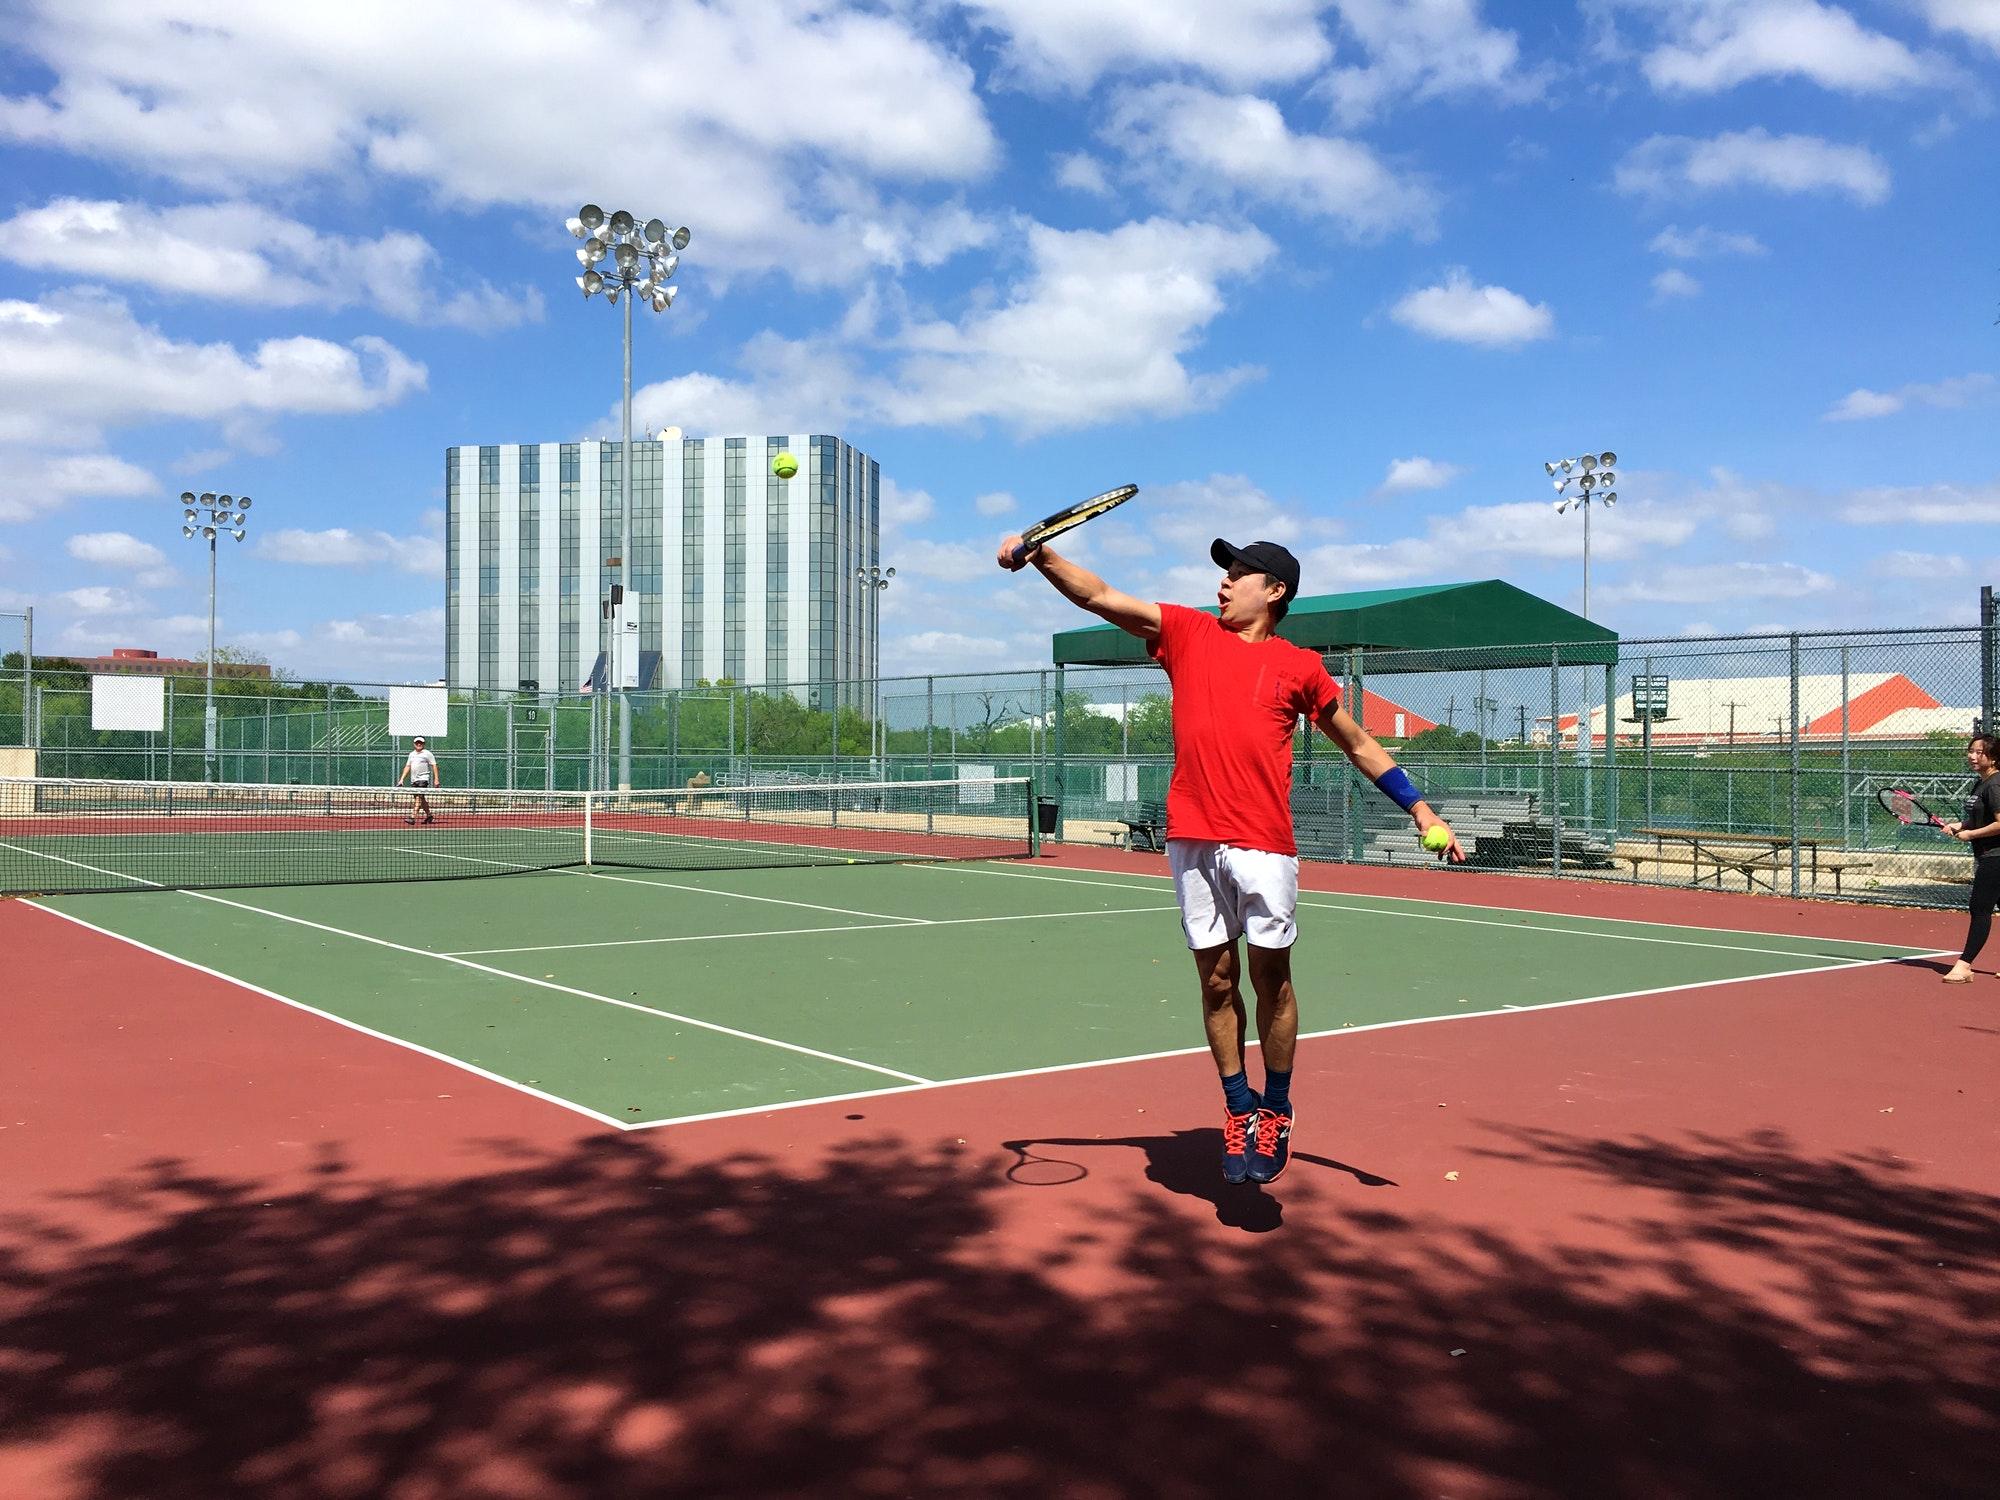 Kevin W. teaches tennis lessons in New Braunfels, TX